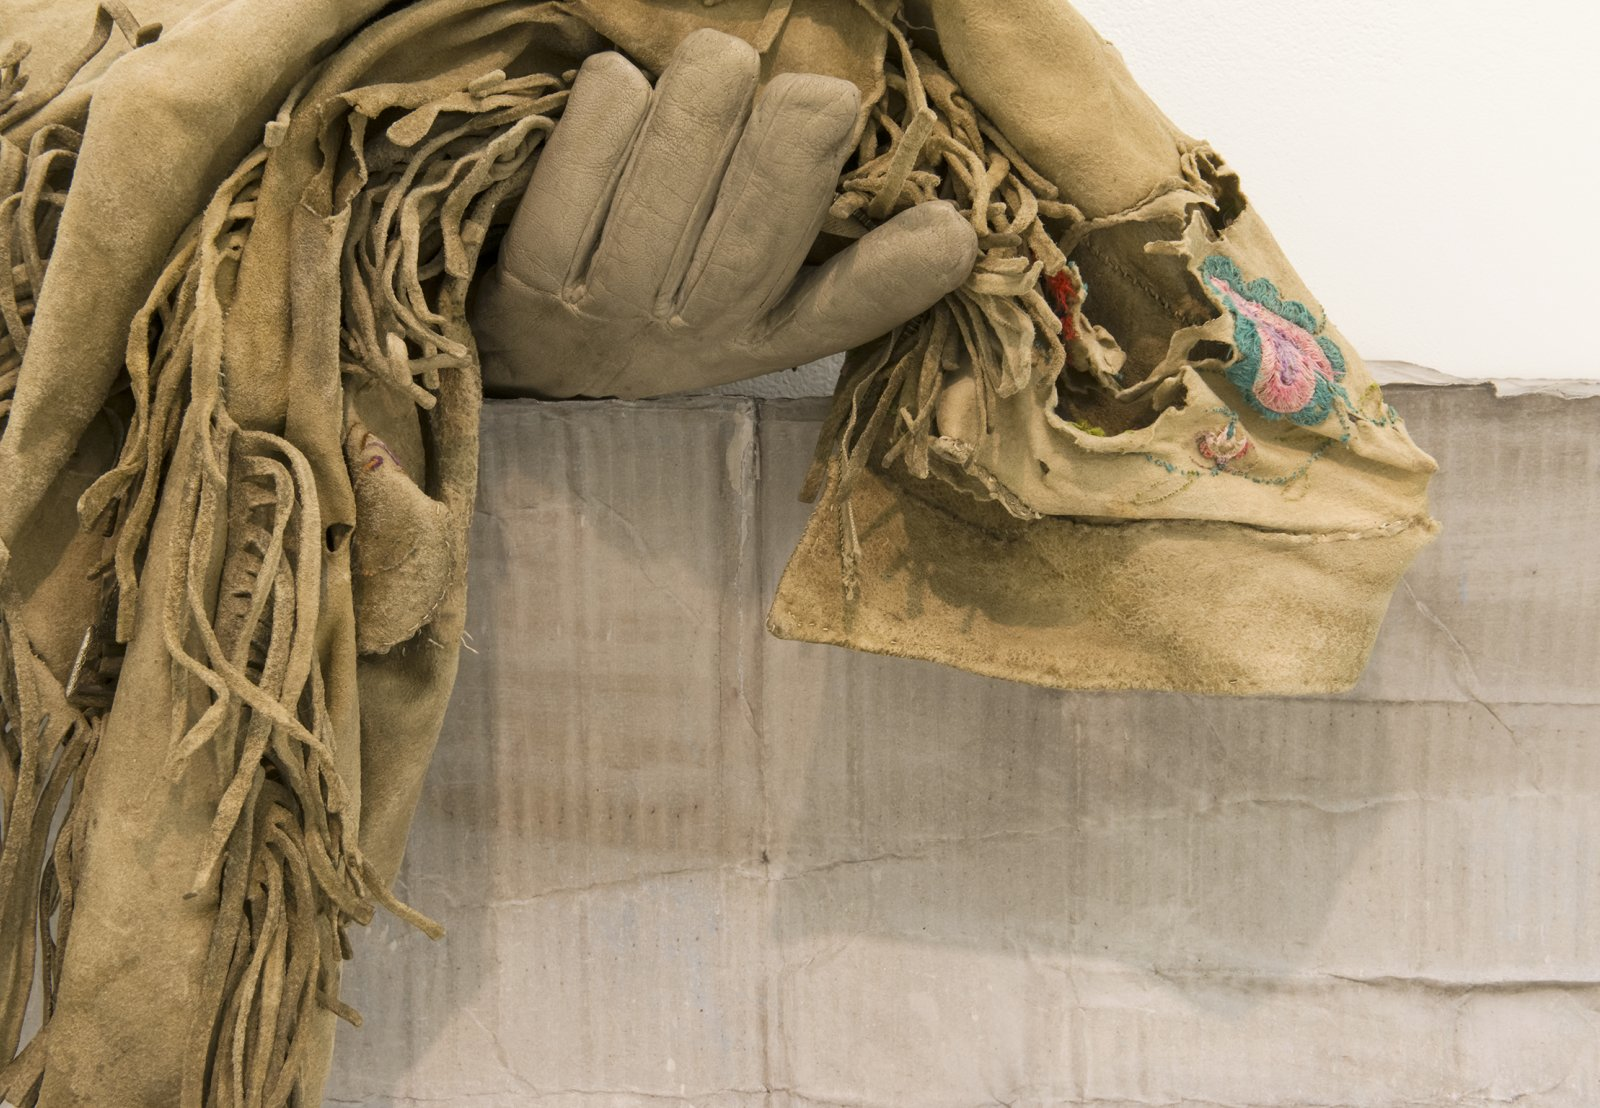 Liz Magor, Still Alive (detail), 2016, polymerized gypsum, deerskin jacket, 19 x 34 x 11 in. (48 x 86 x 27 cm) by Liz Magor